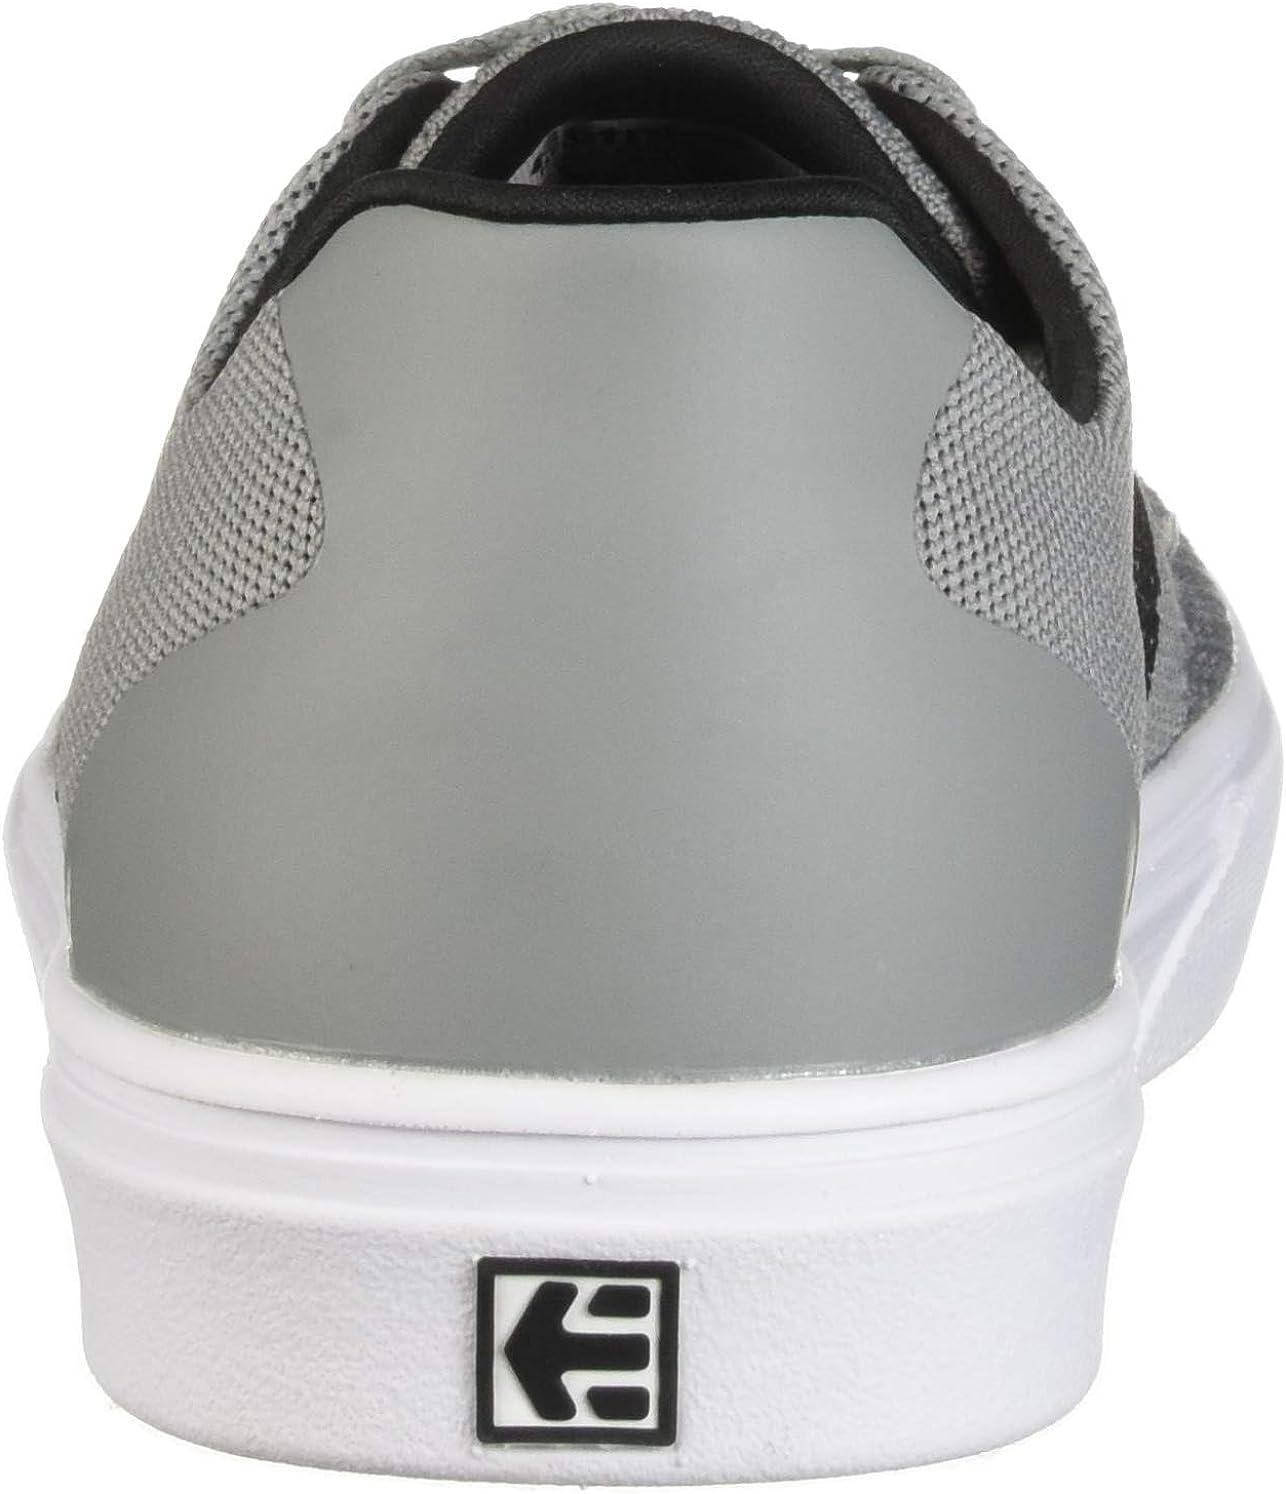 Etnies Men's Stratus Trainers Grey Black